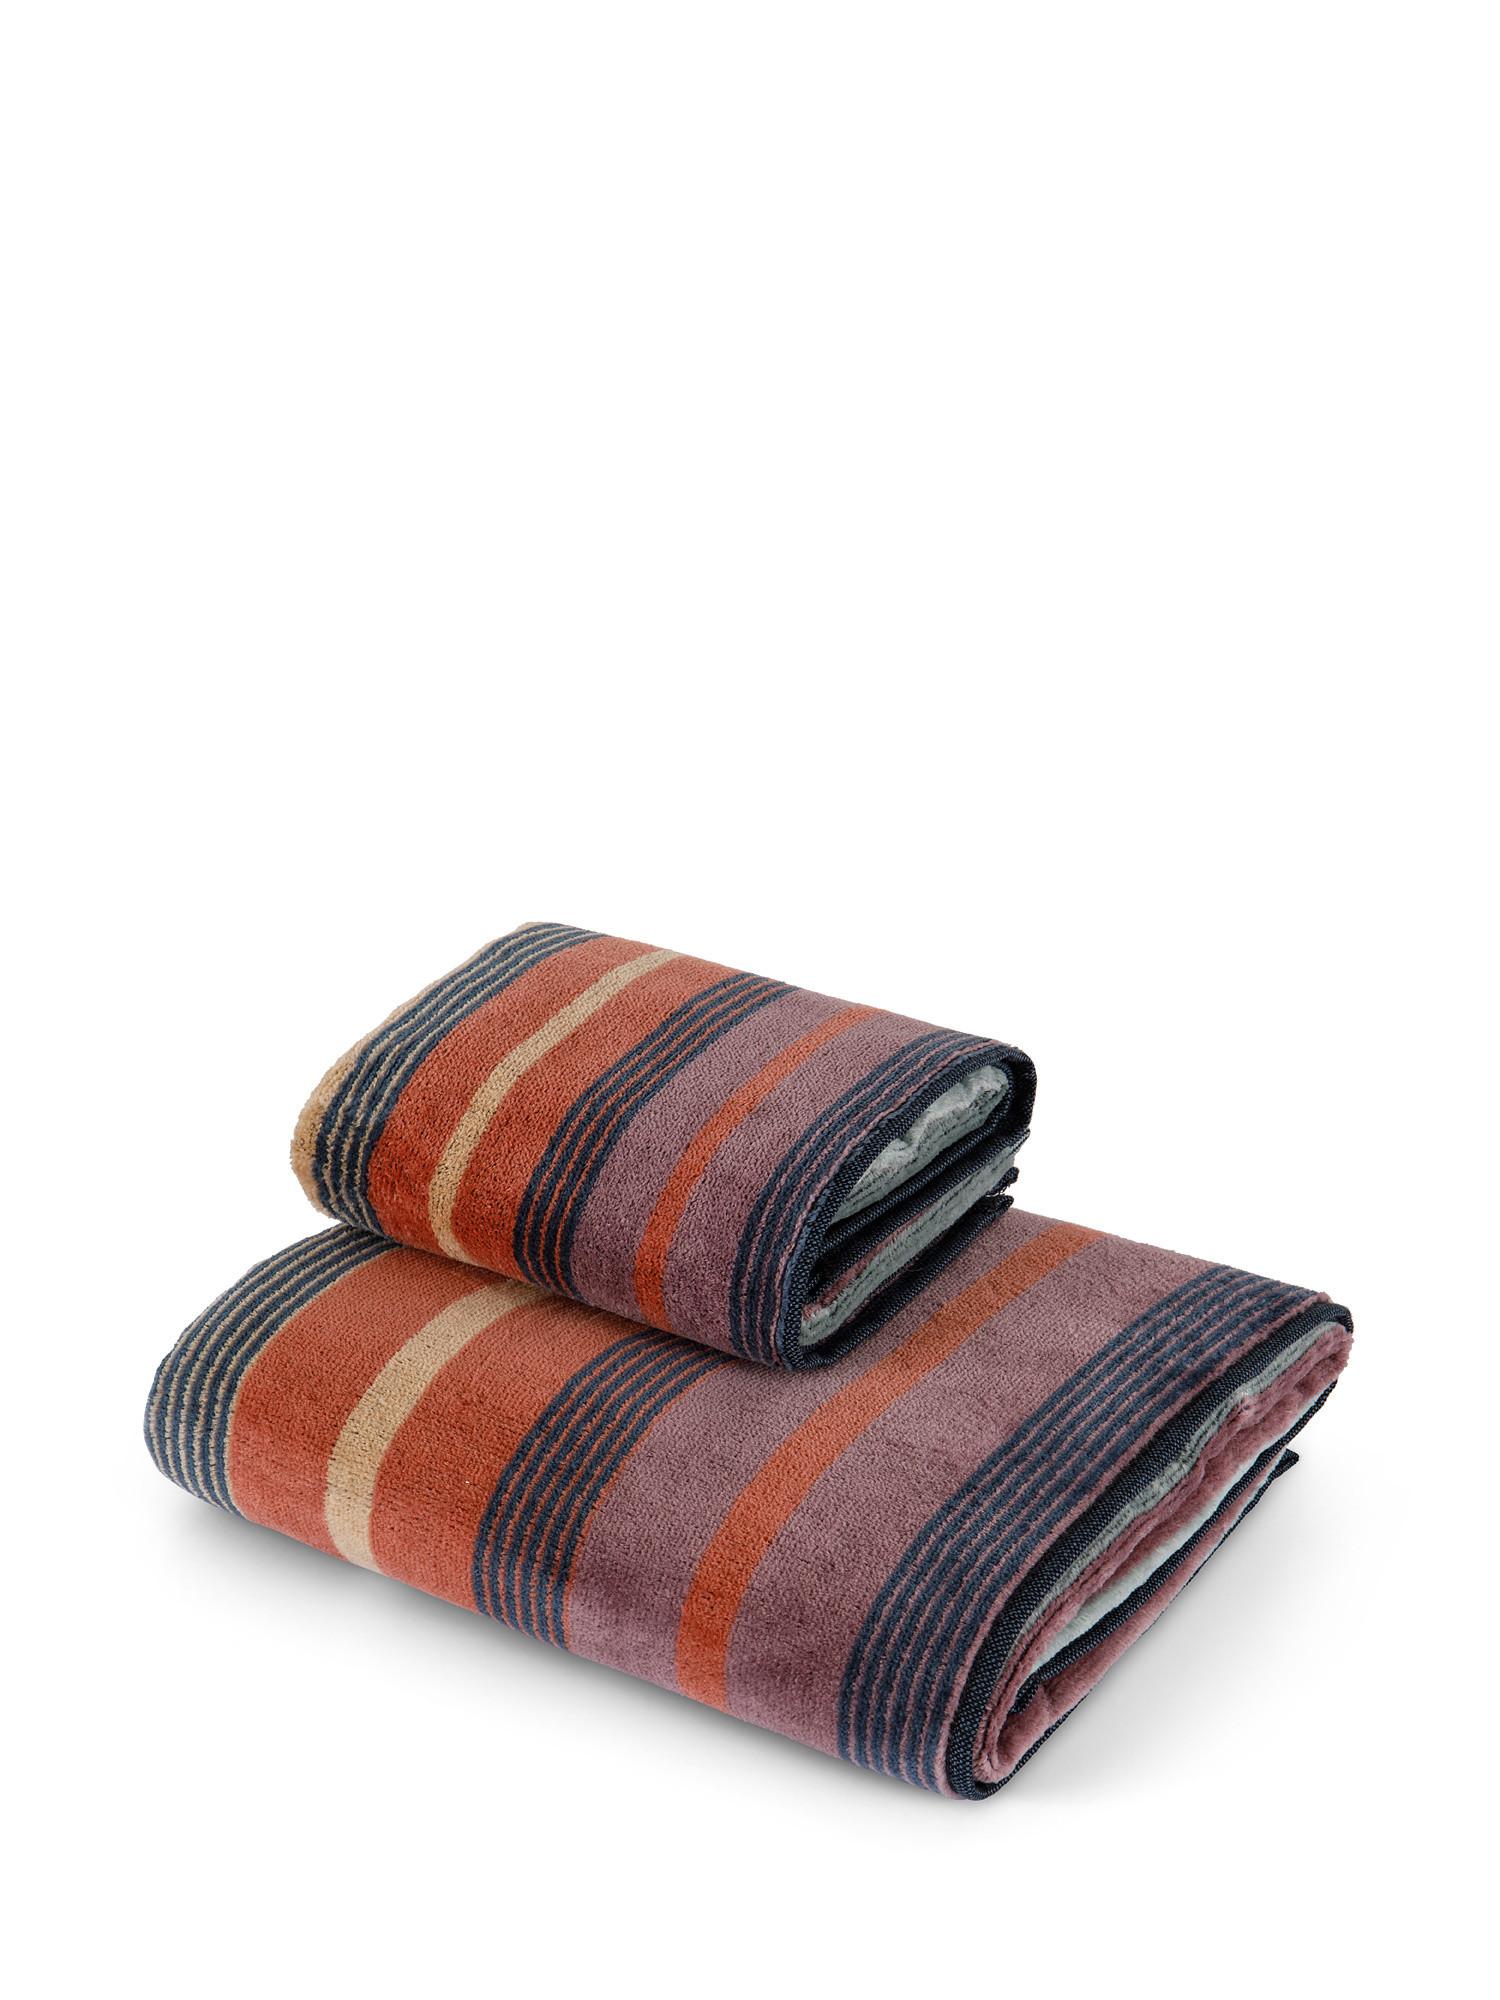 Asciugamano cotone velour motivo righe larghe, Multicolor, large image number 0